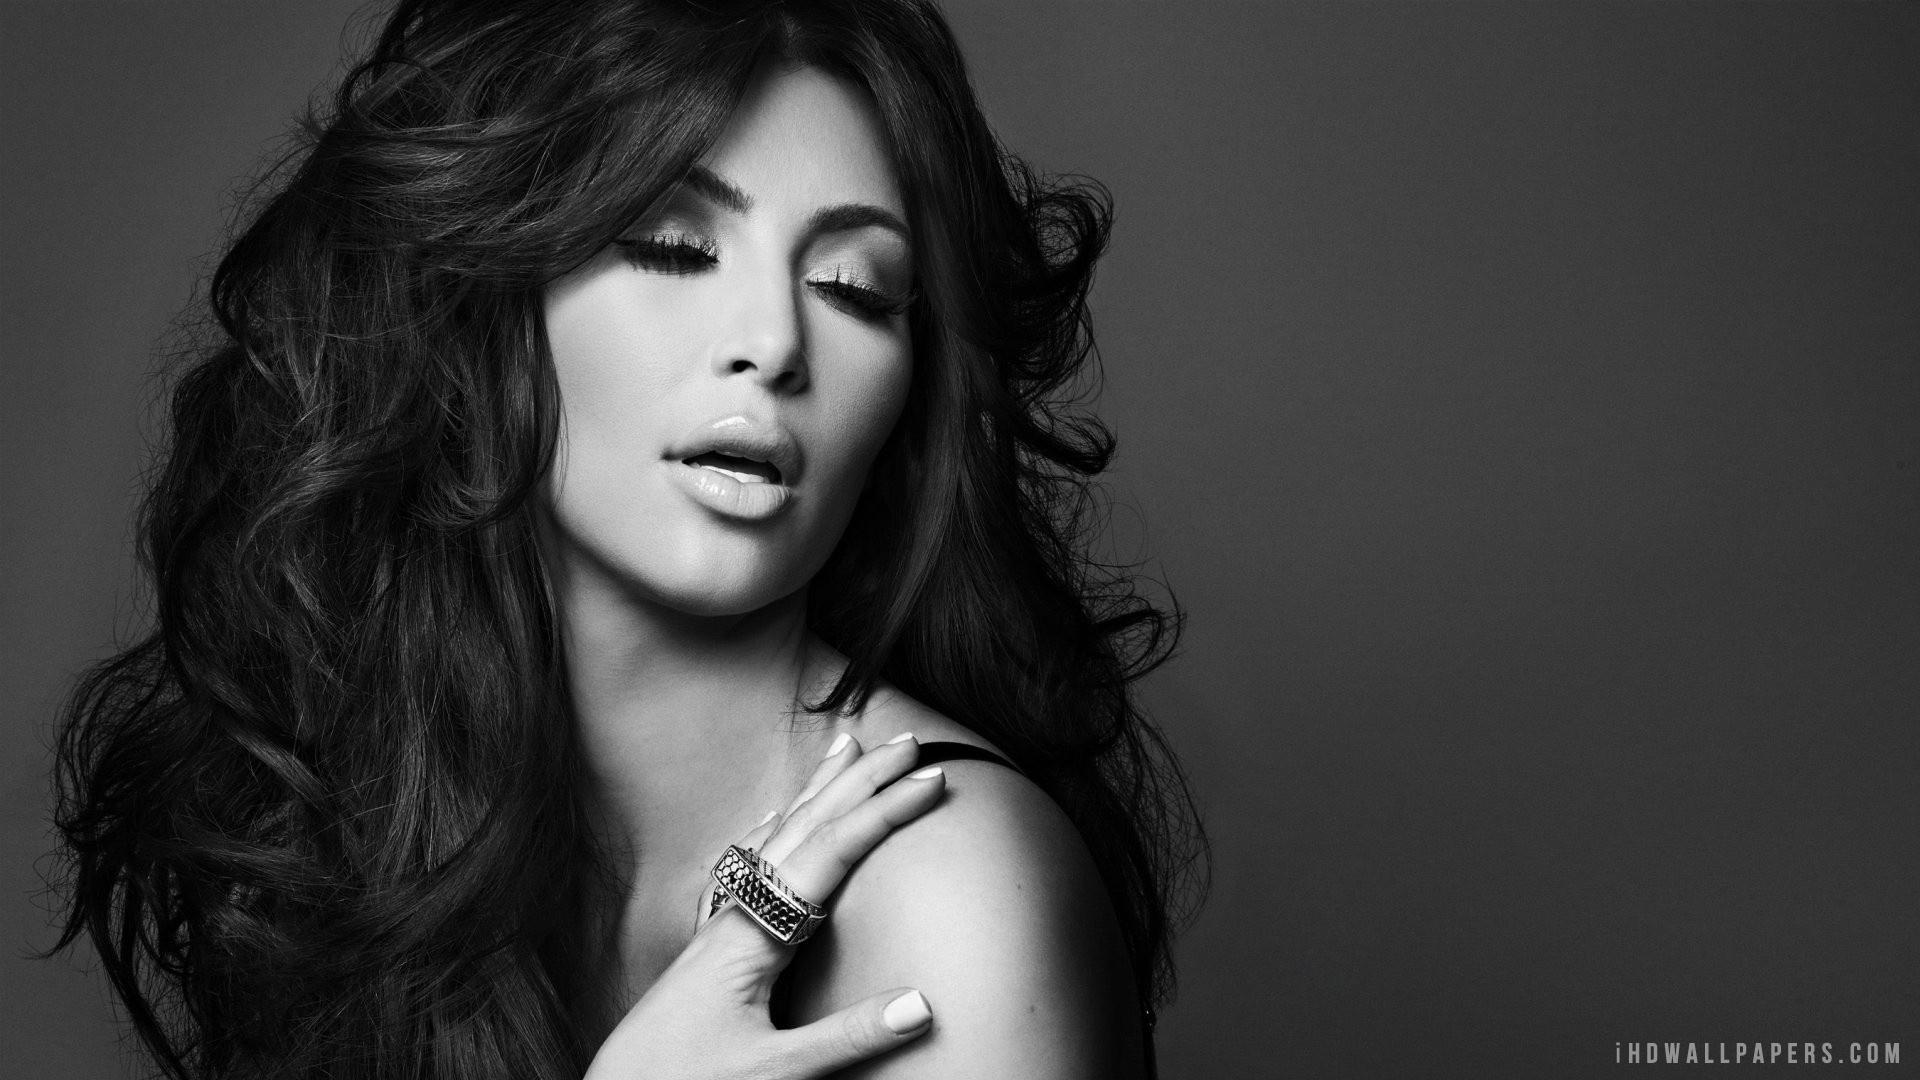 Kim Kardashian HD Wallpaper   iHD Wallpapers 1920x1080